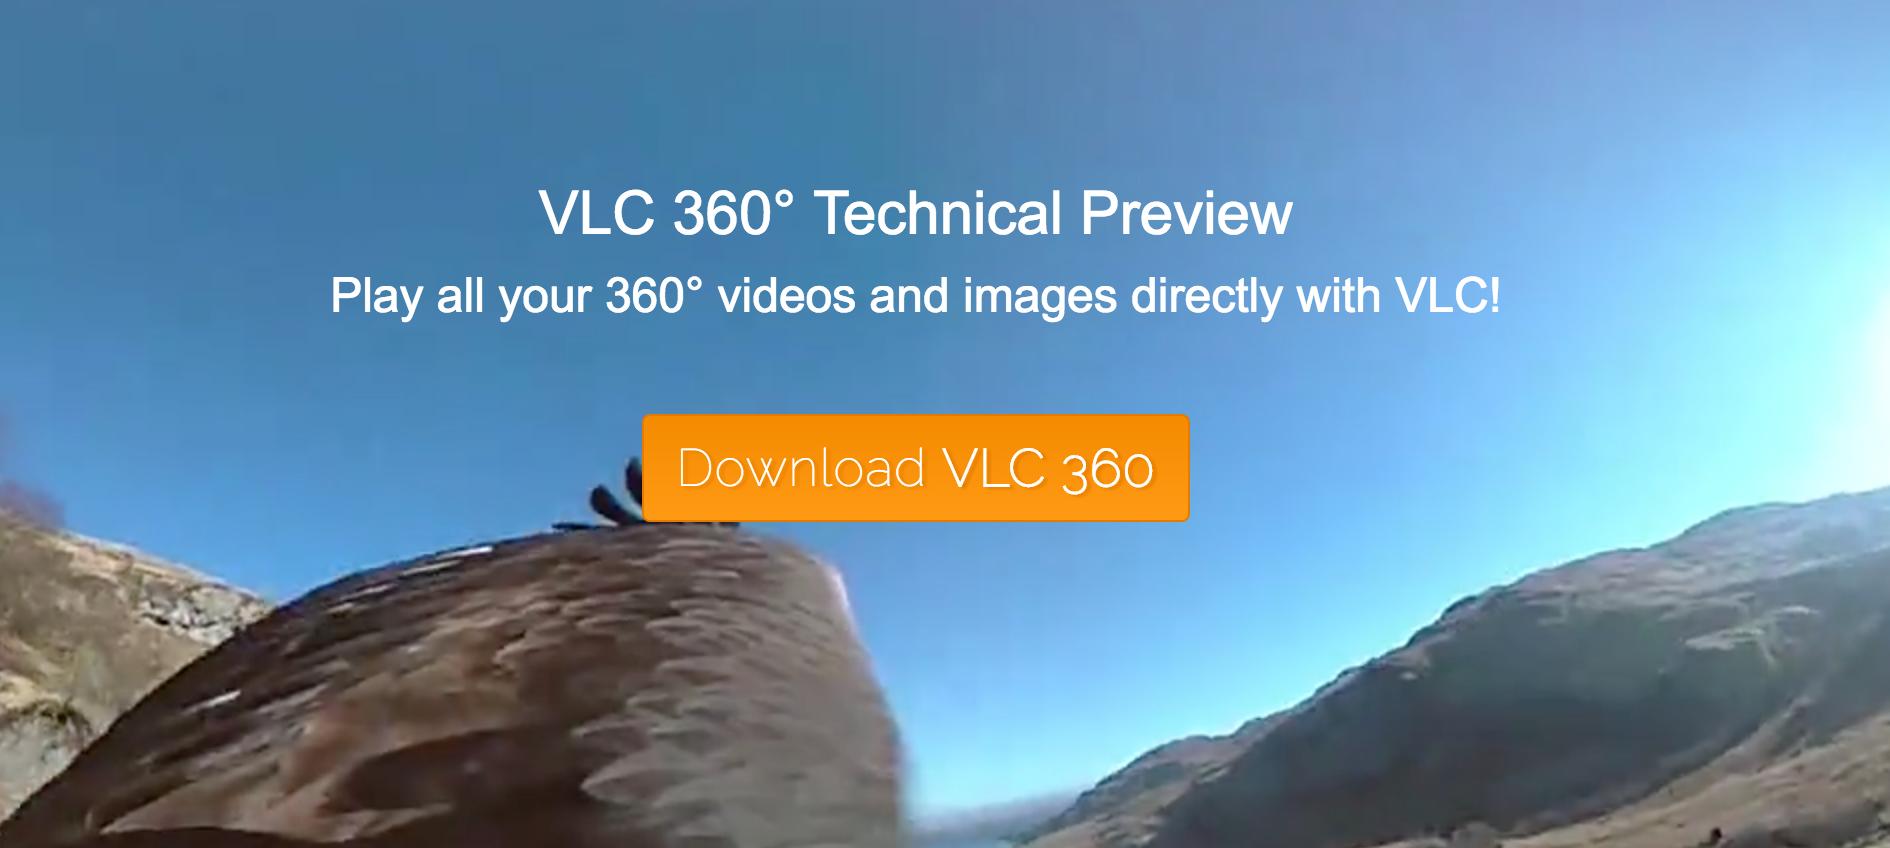 VLC 360, VLC Media Player Preview, VLC Media Player Preview Availability, VLC Media Player Preview 360, VLC Media Player Preview Release, VLC Media Player Preview Support, VLC Media Player 3.0, VLC 3.0, VLC Media Player full version